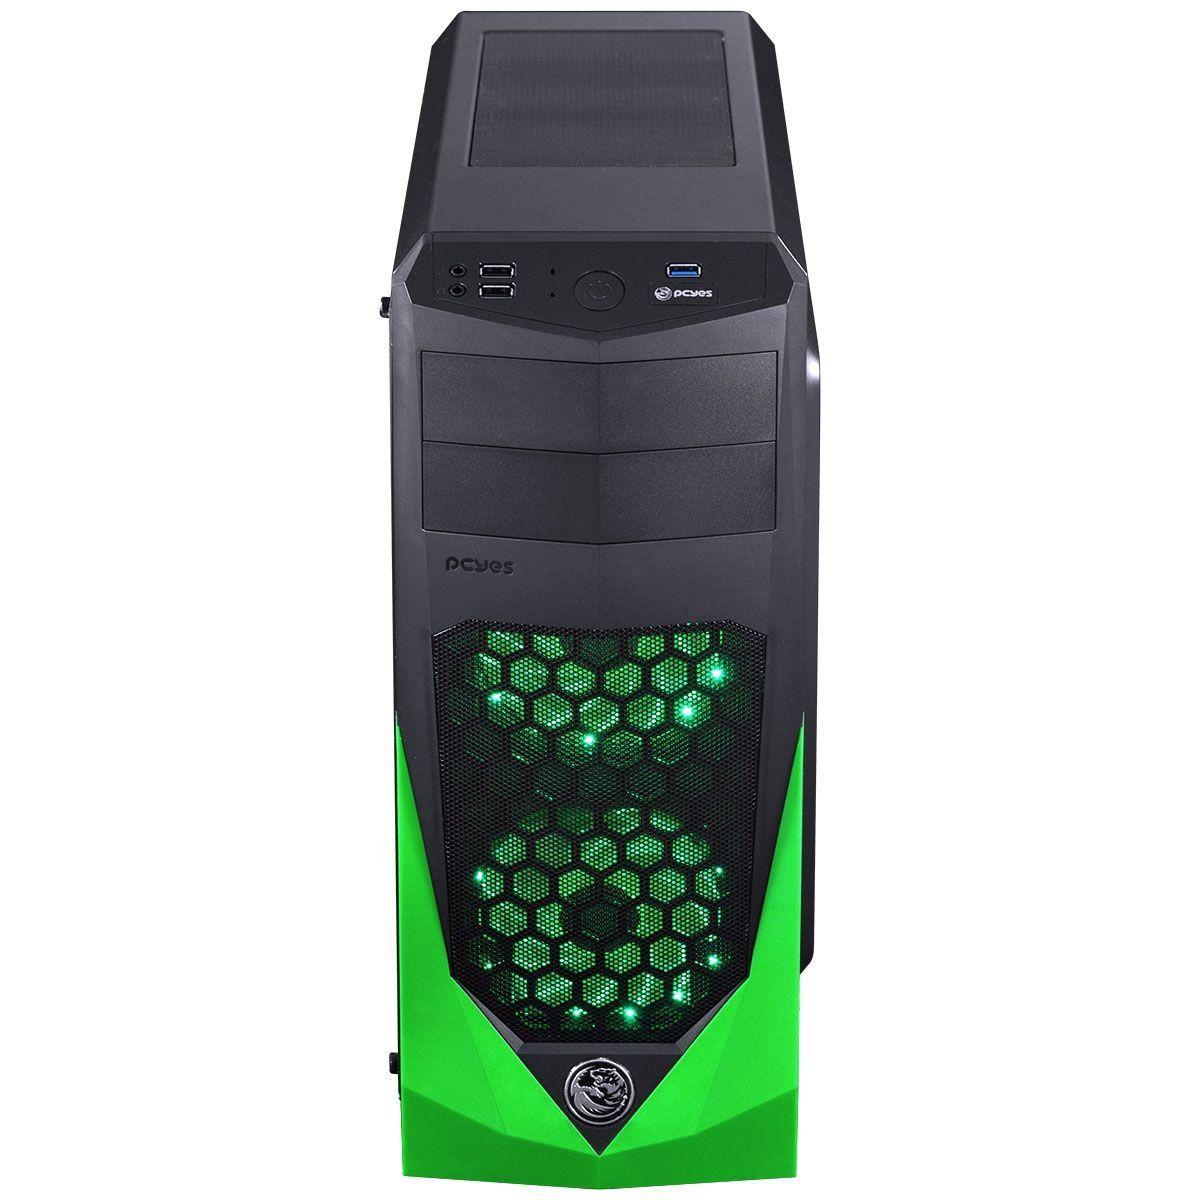 Gabinete ATX VTI Verde com 3 Fans LED Verde Lateral em Acrílico VTIPTOVD3FCAF - Pcyes